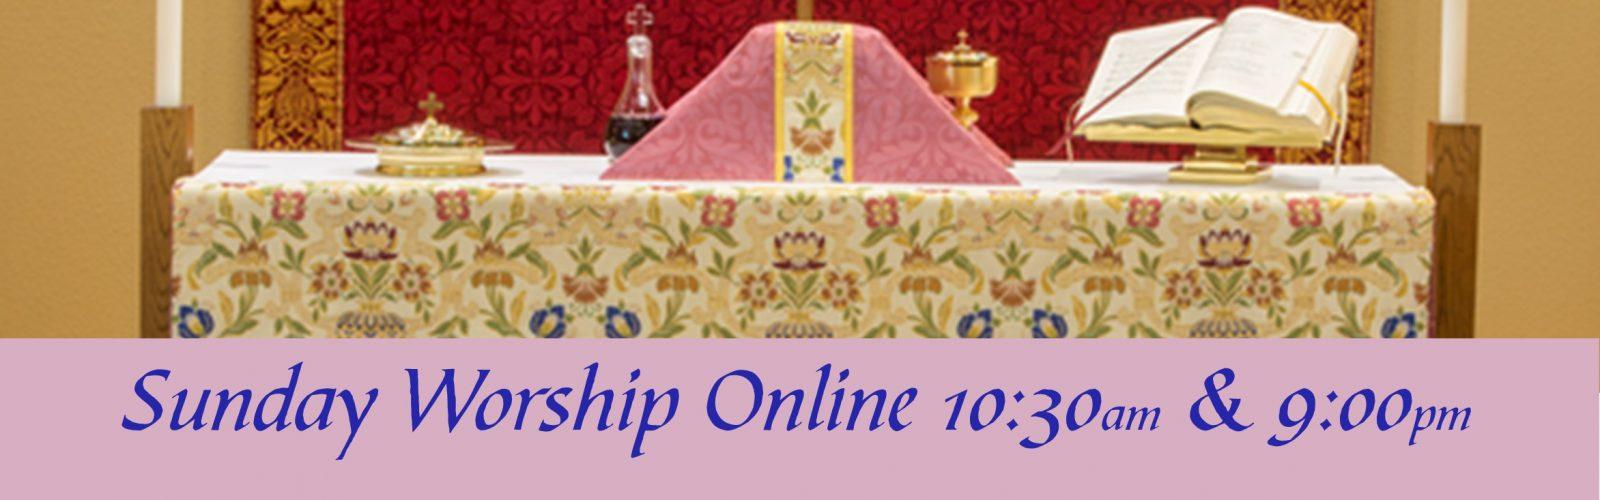 Rose Frontal Worship Banner-Slider